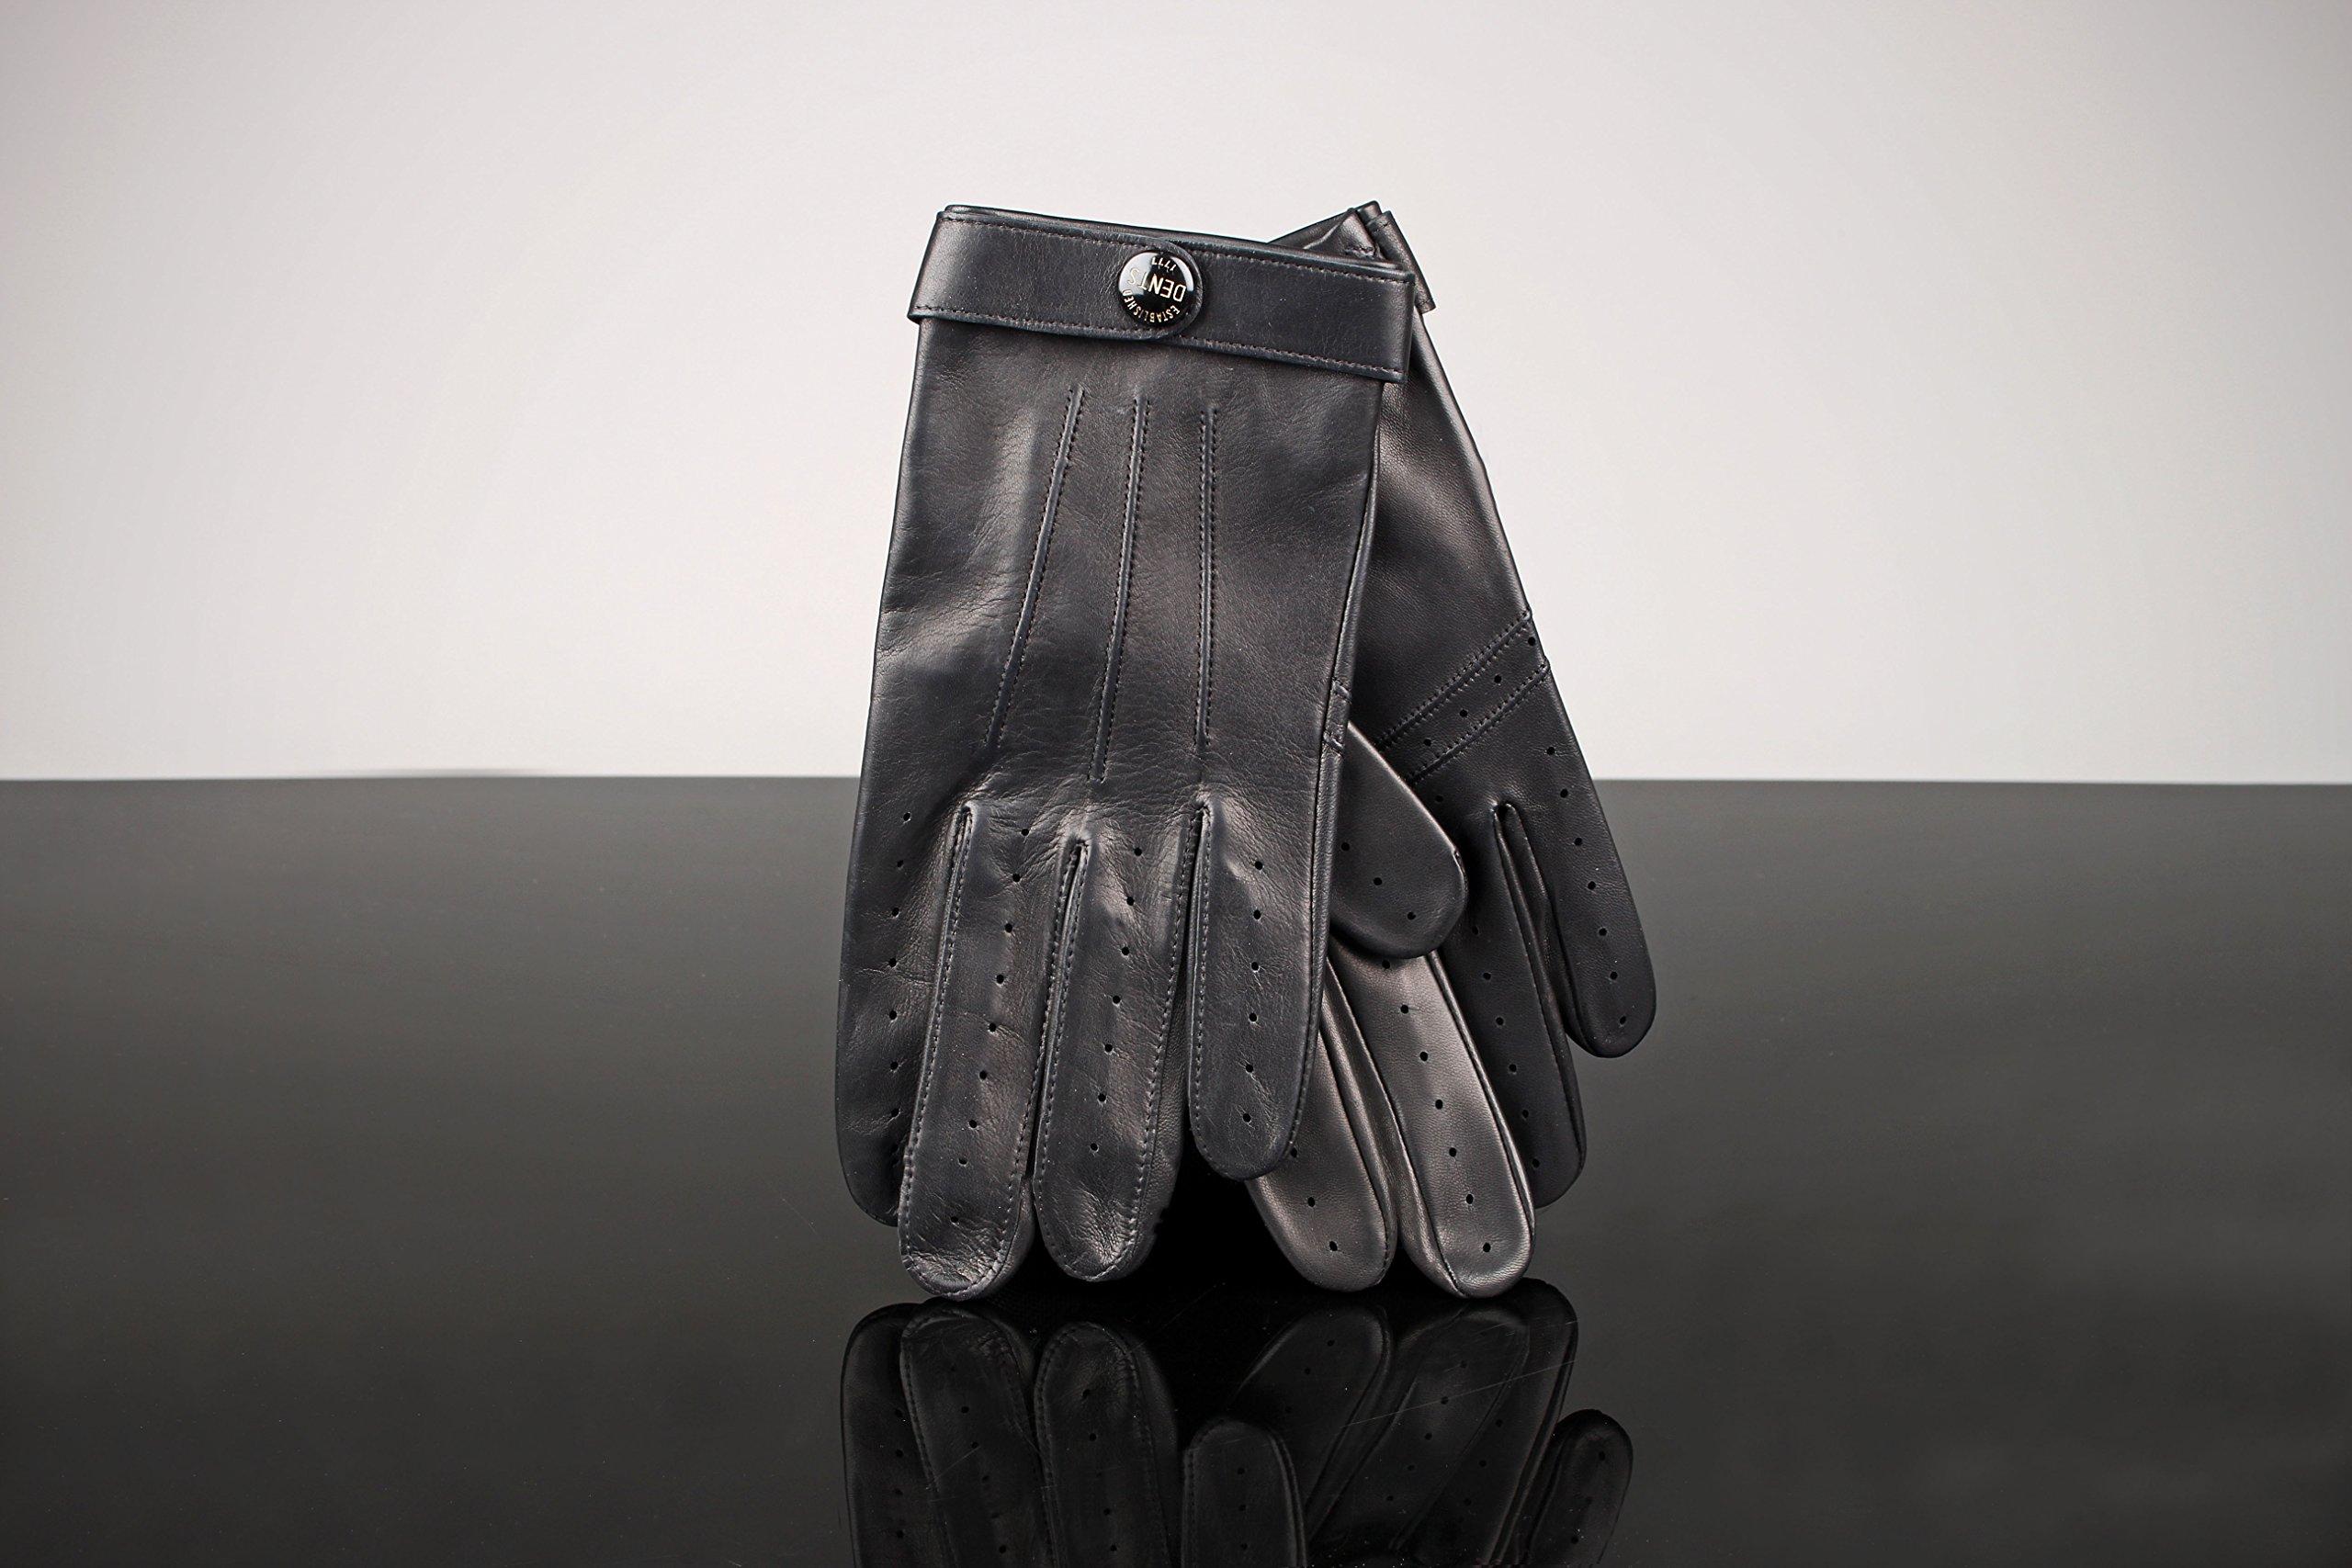 DENTS James Bond Spectre Leather Gloves 15-1007 - Black - XL